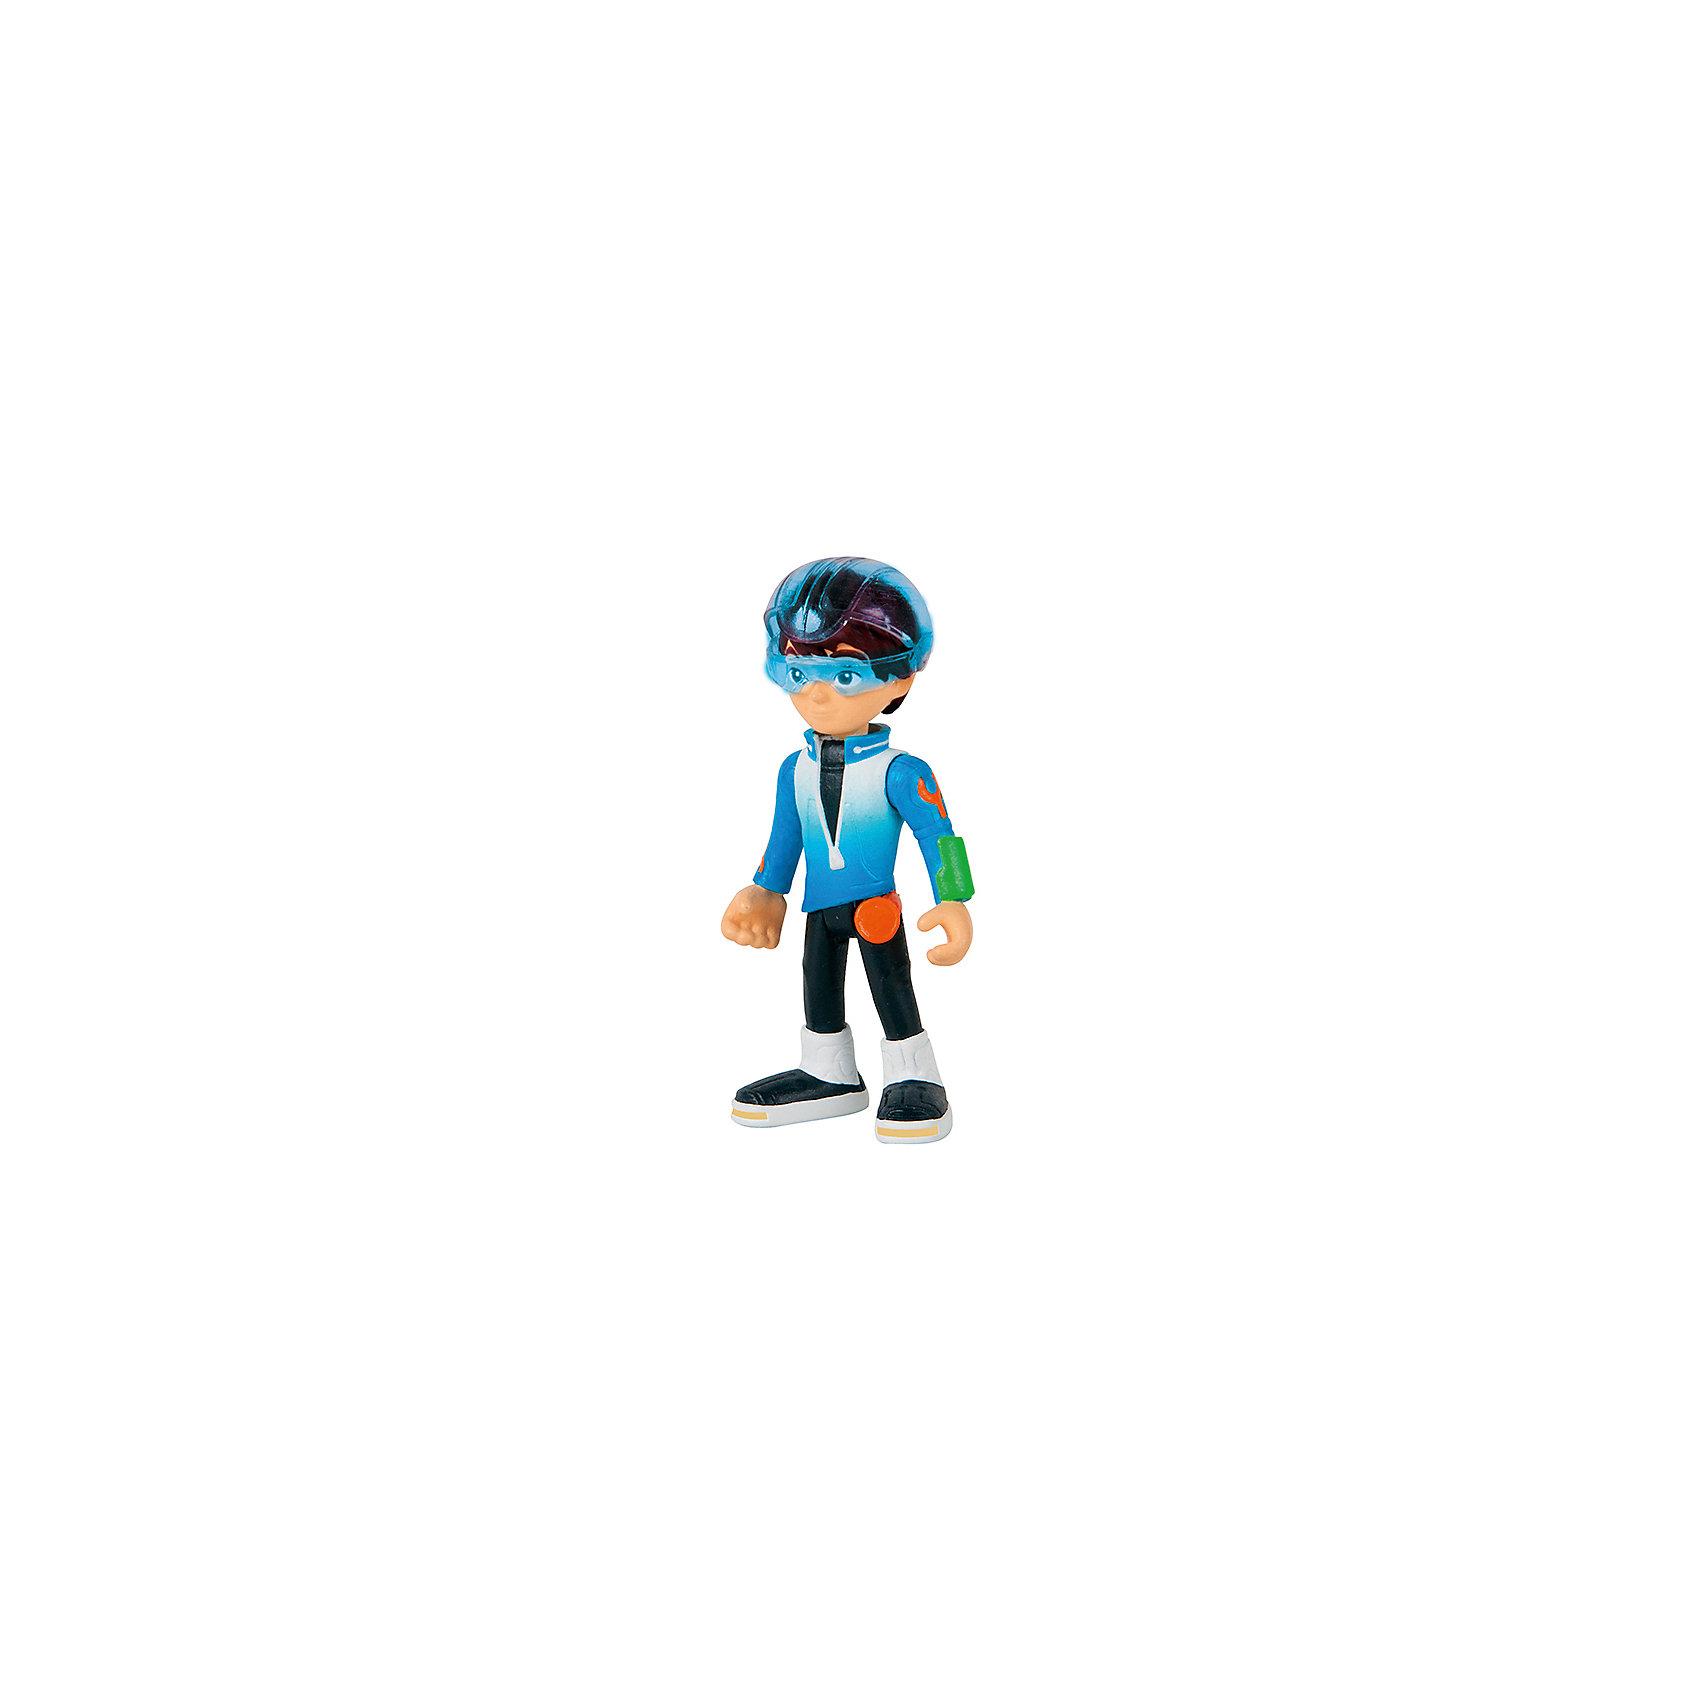 - Фигурка Майлз со звездолётом, 7 см, MILES купить шлем летчика в минске